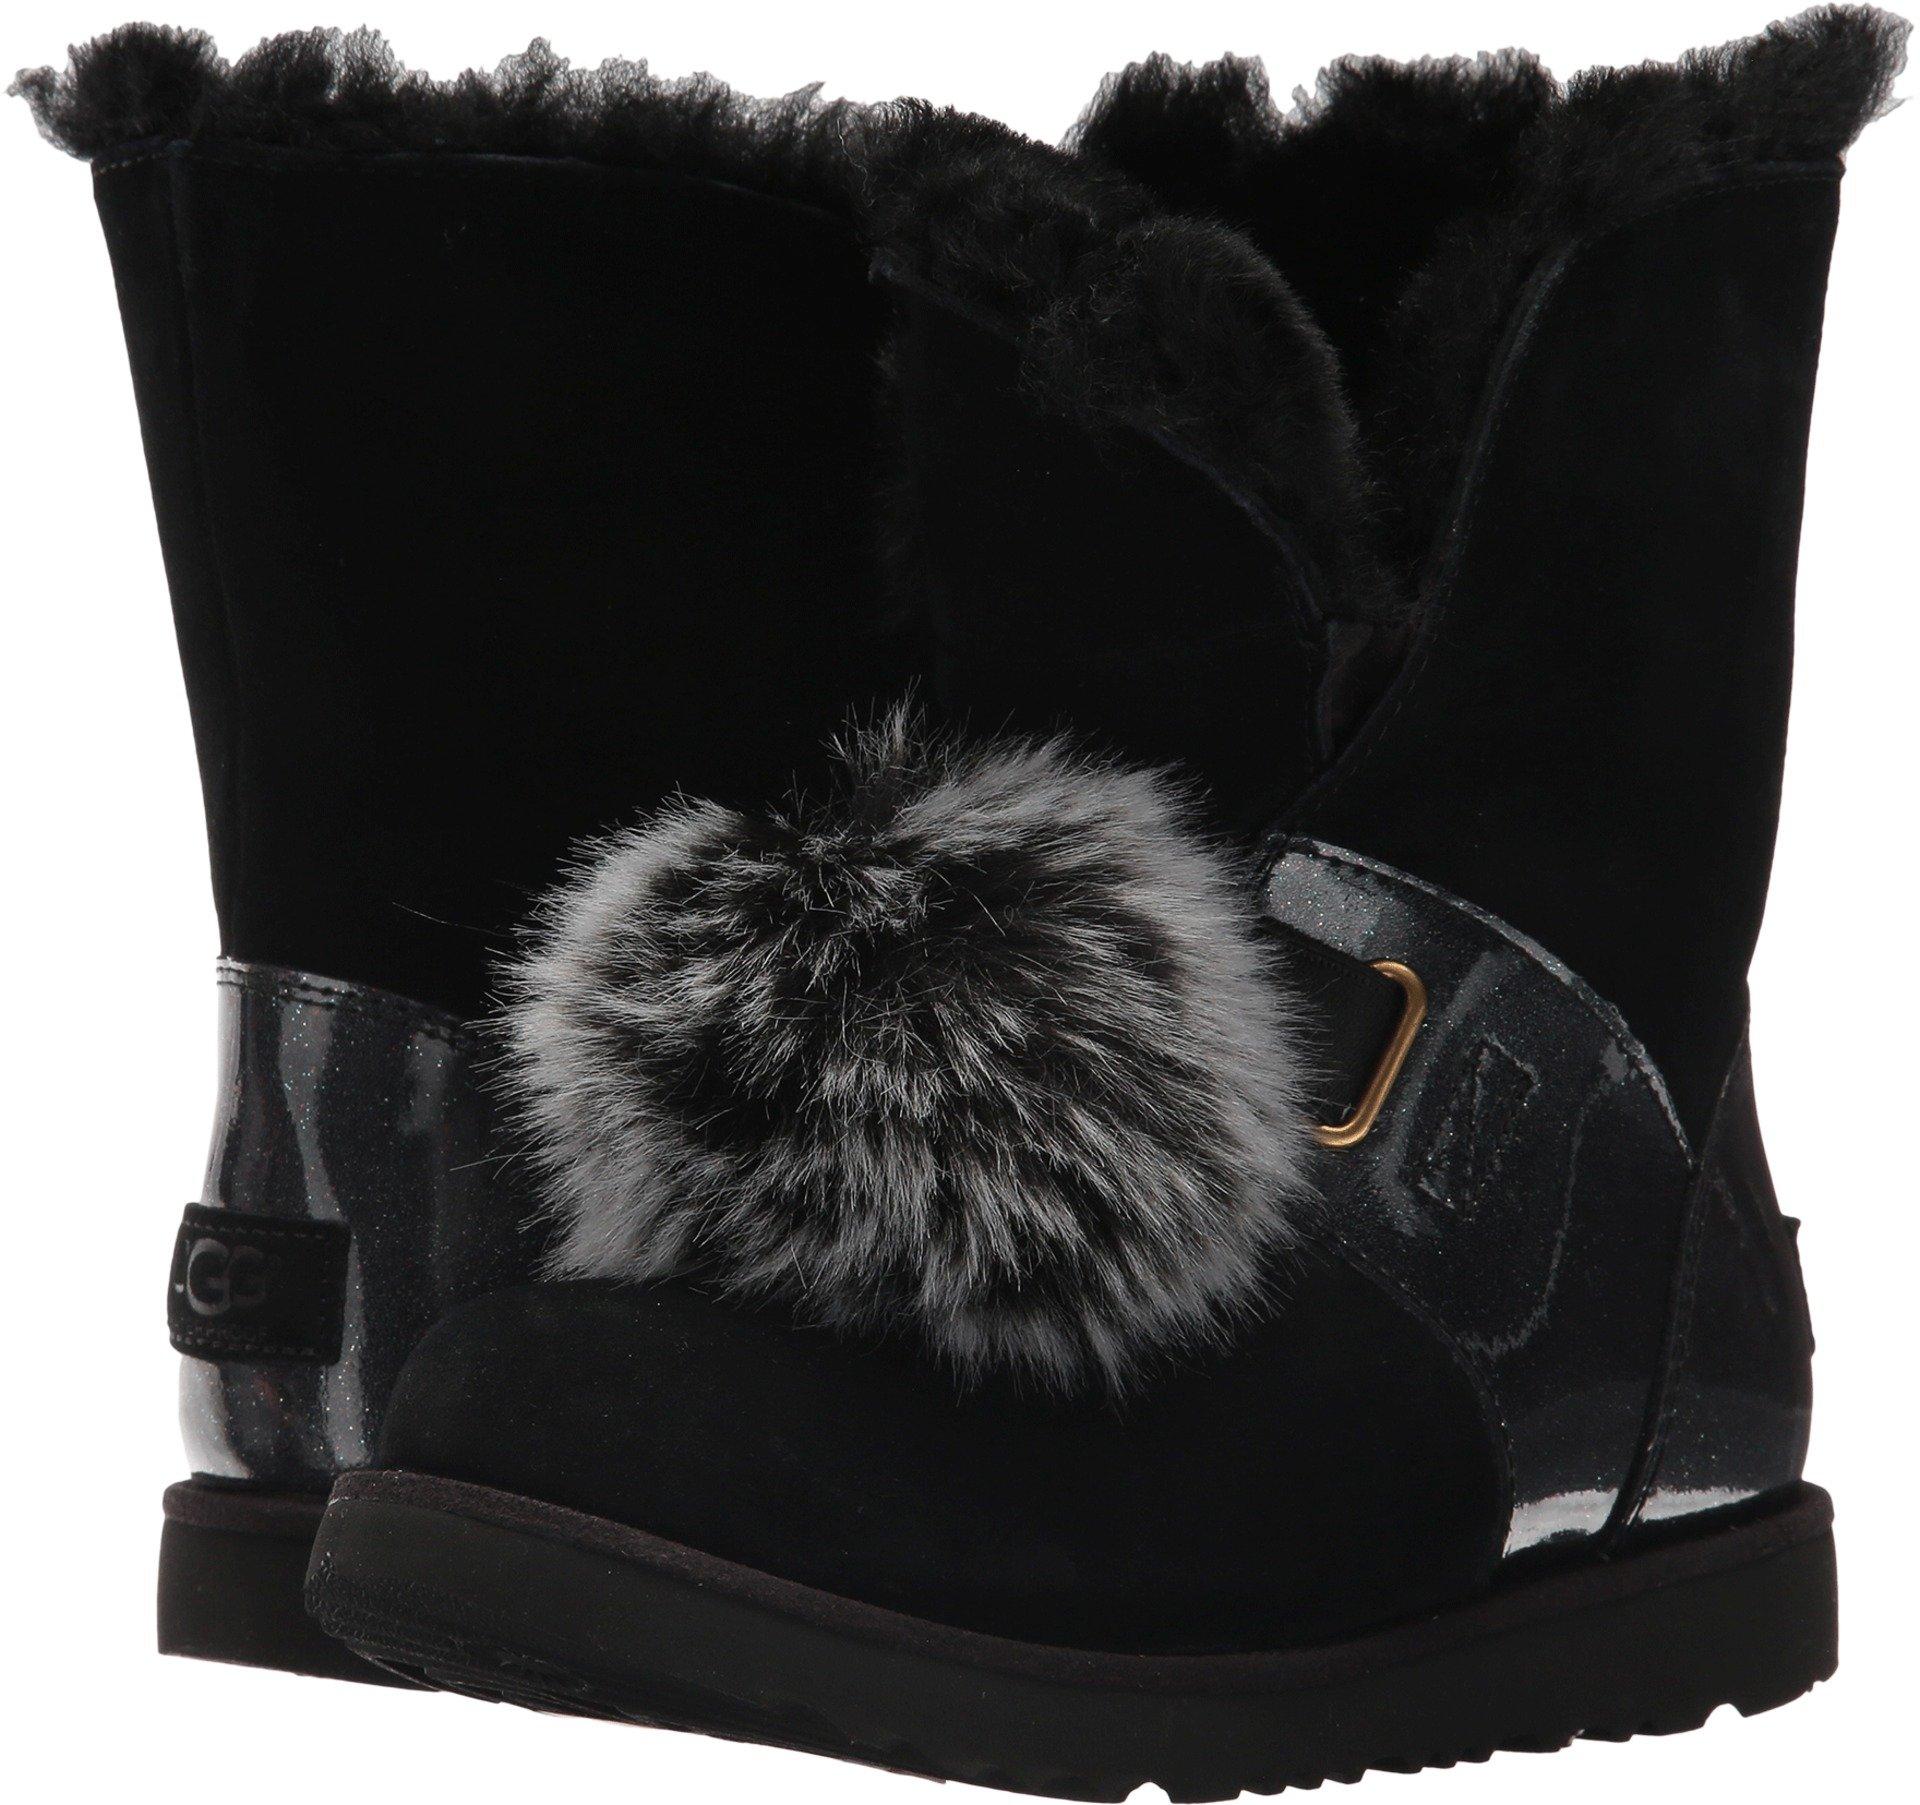 UGG Girls Isley Patent WP Boot Black Size 4 Big Kid M